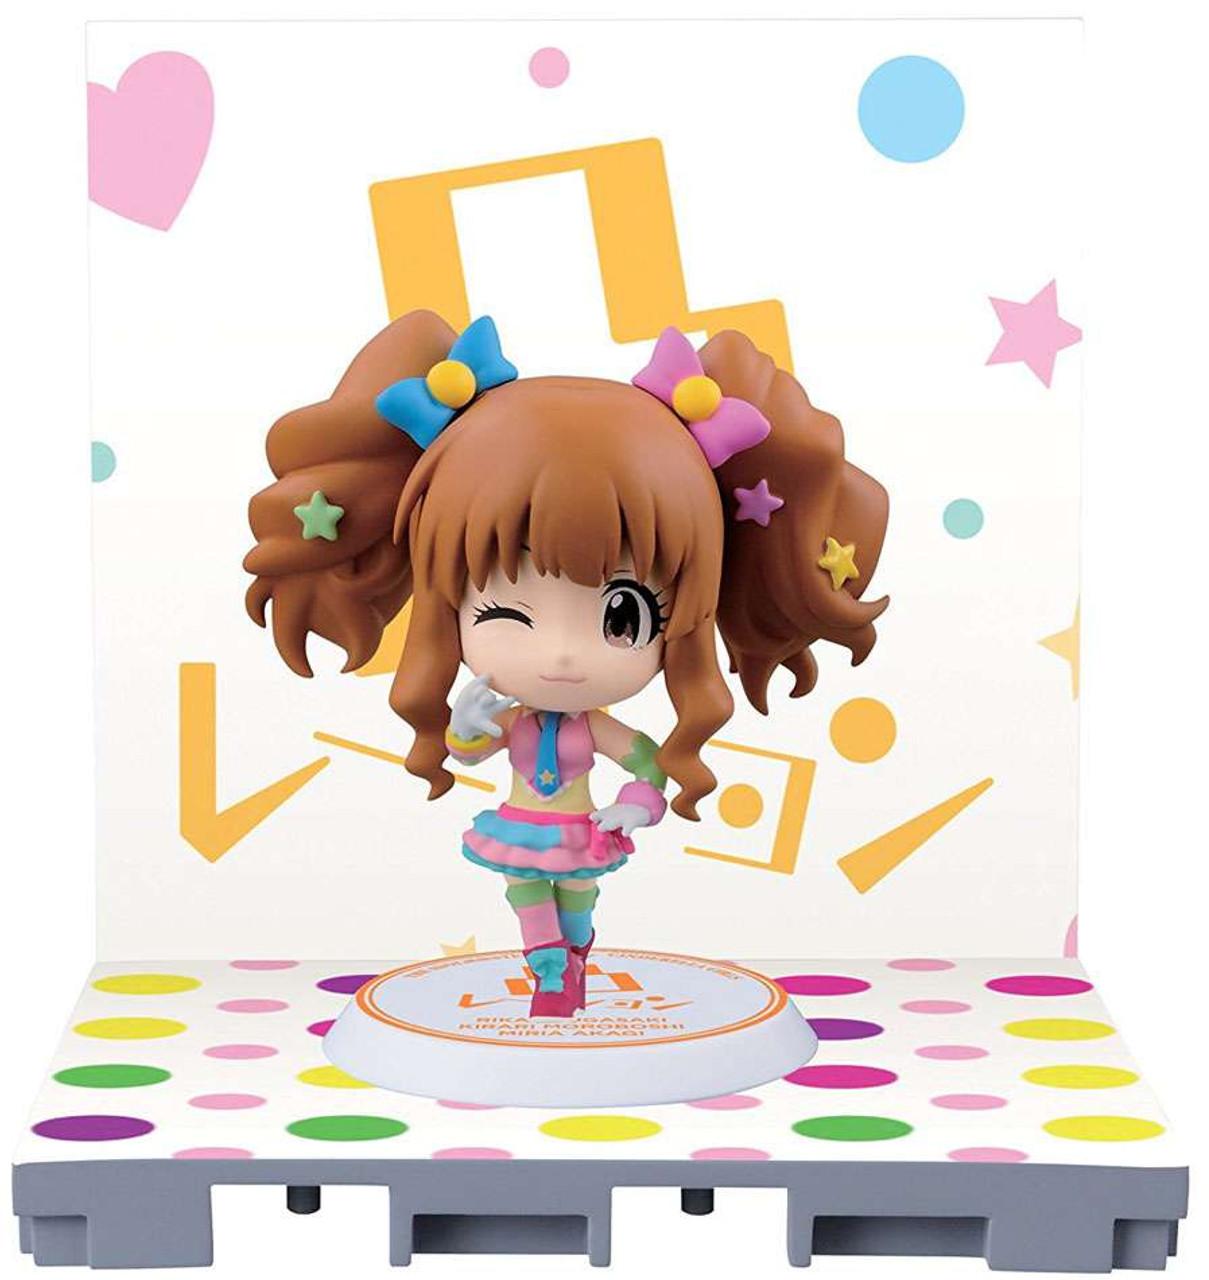 Idolmaster: Cinderella Girls Kirari Moroboshi 2.4-Inch Chibi-Kyun-Chara Figure [Let's Go Happy!]